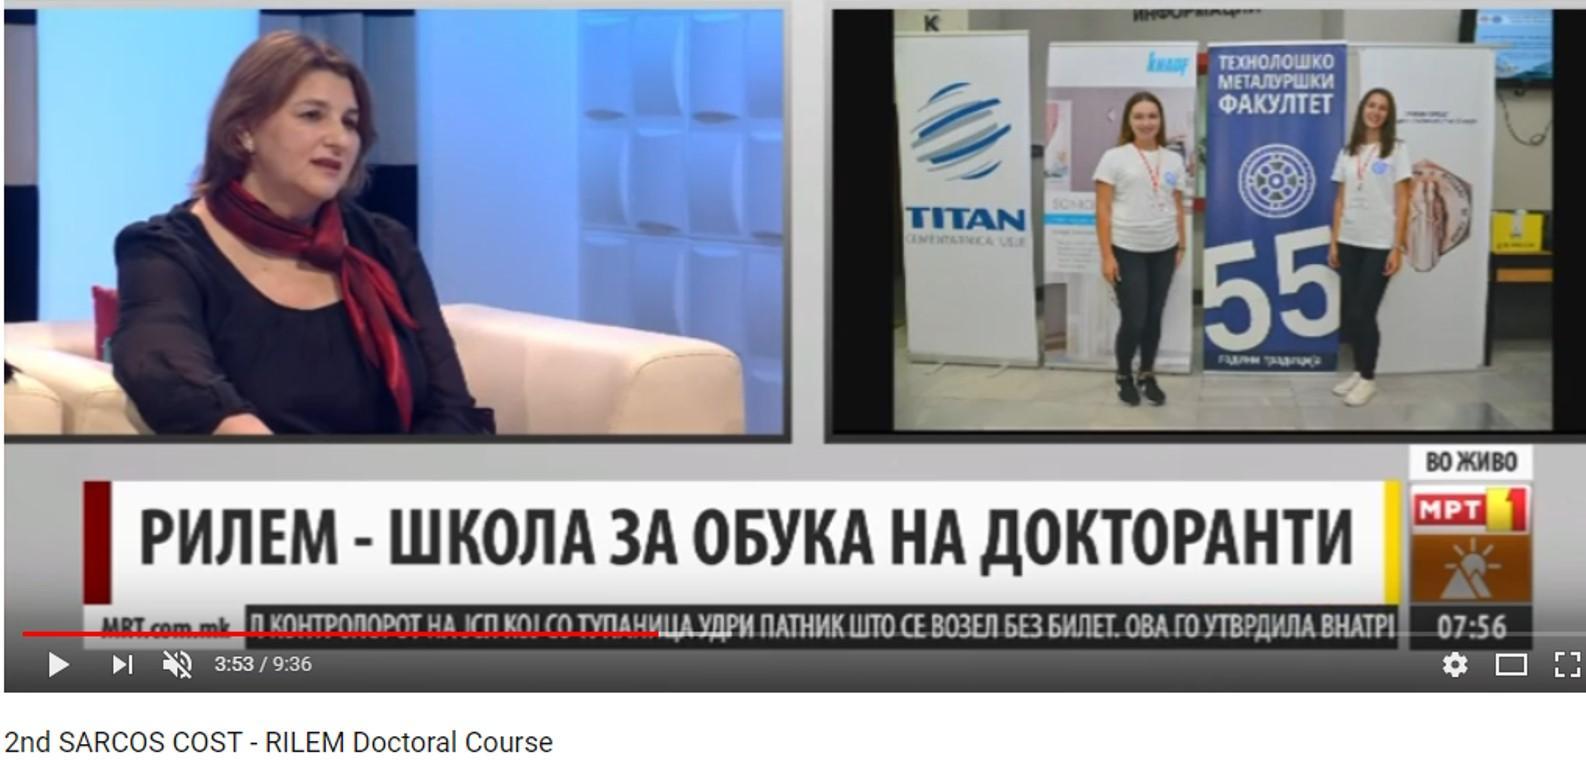 2nd SARCOS Training School // Macedonian TV